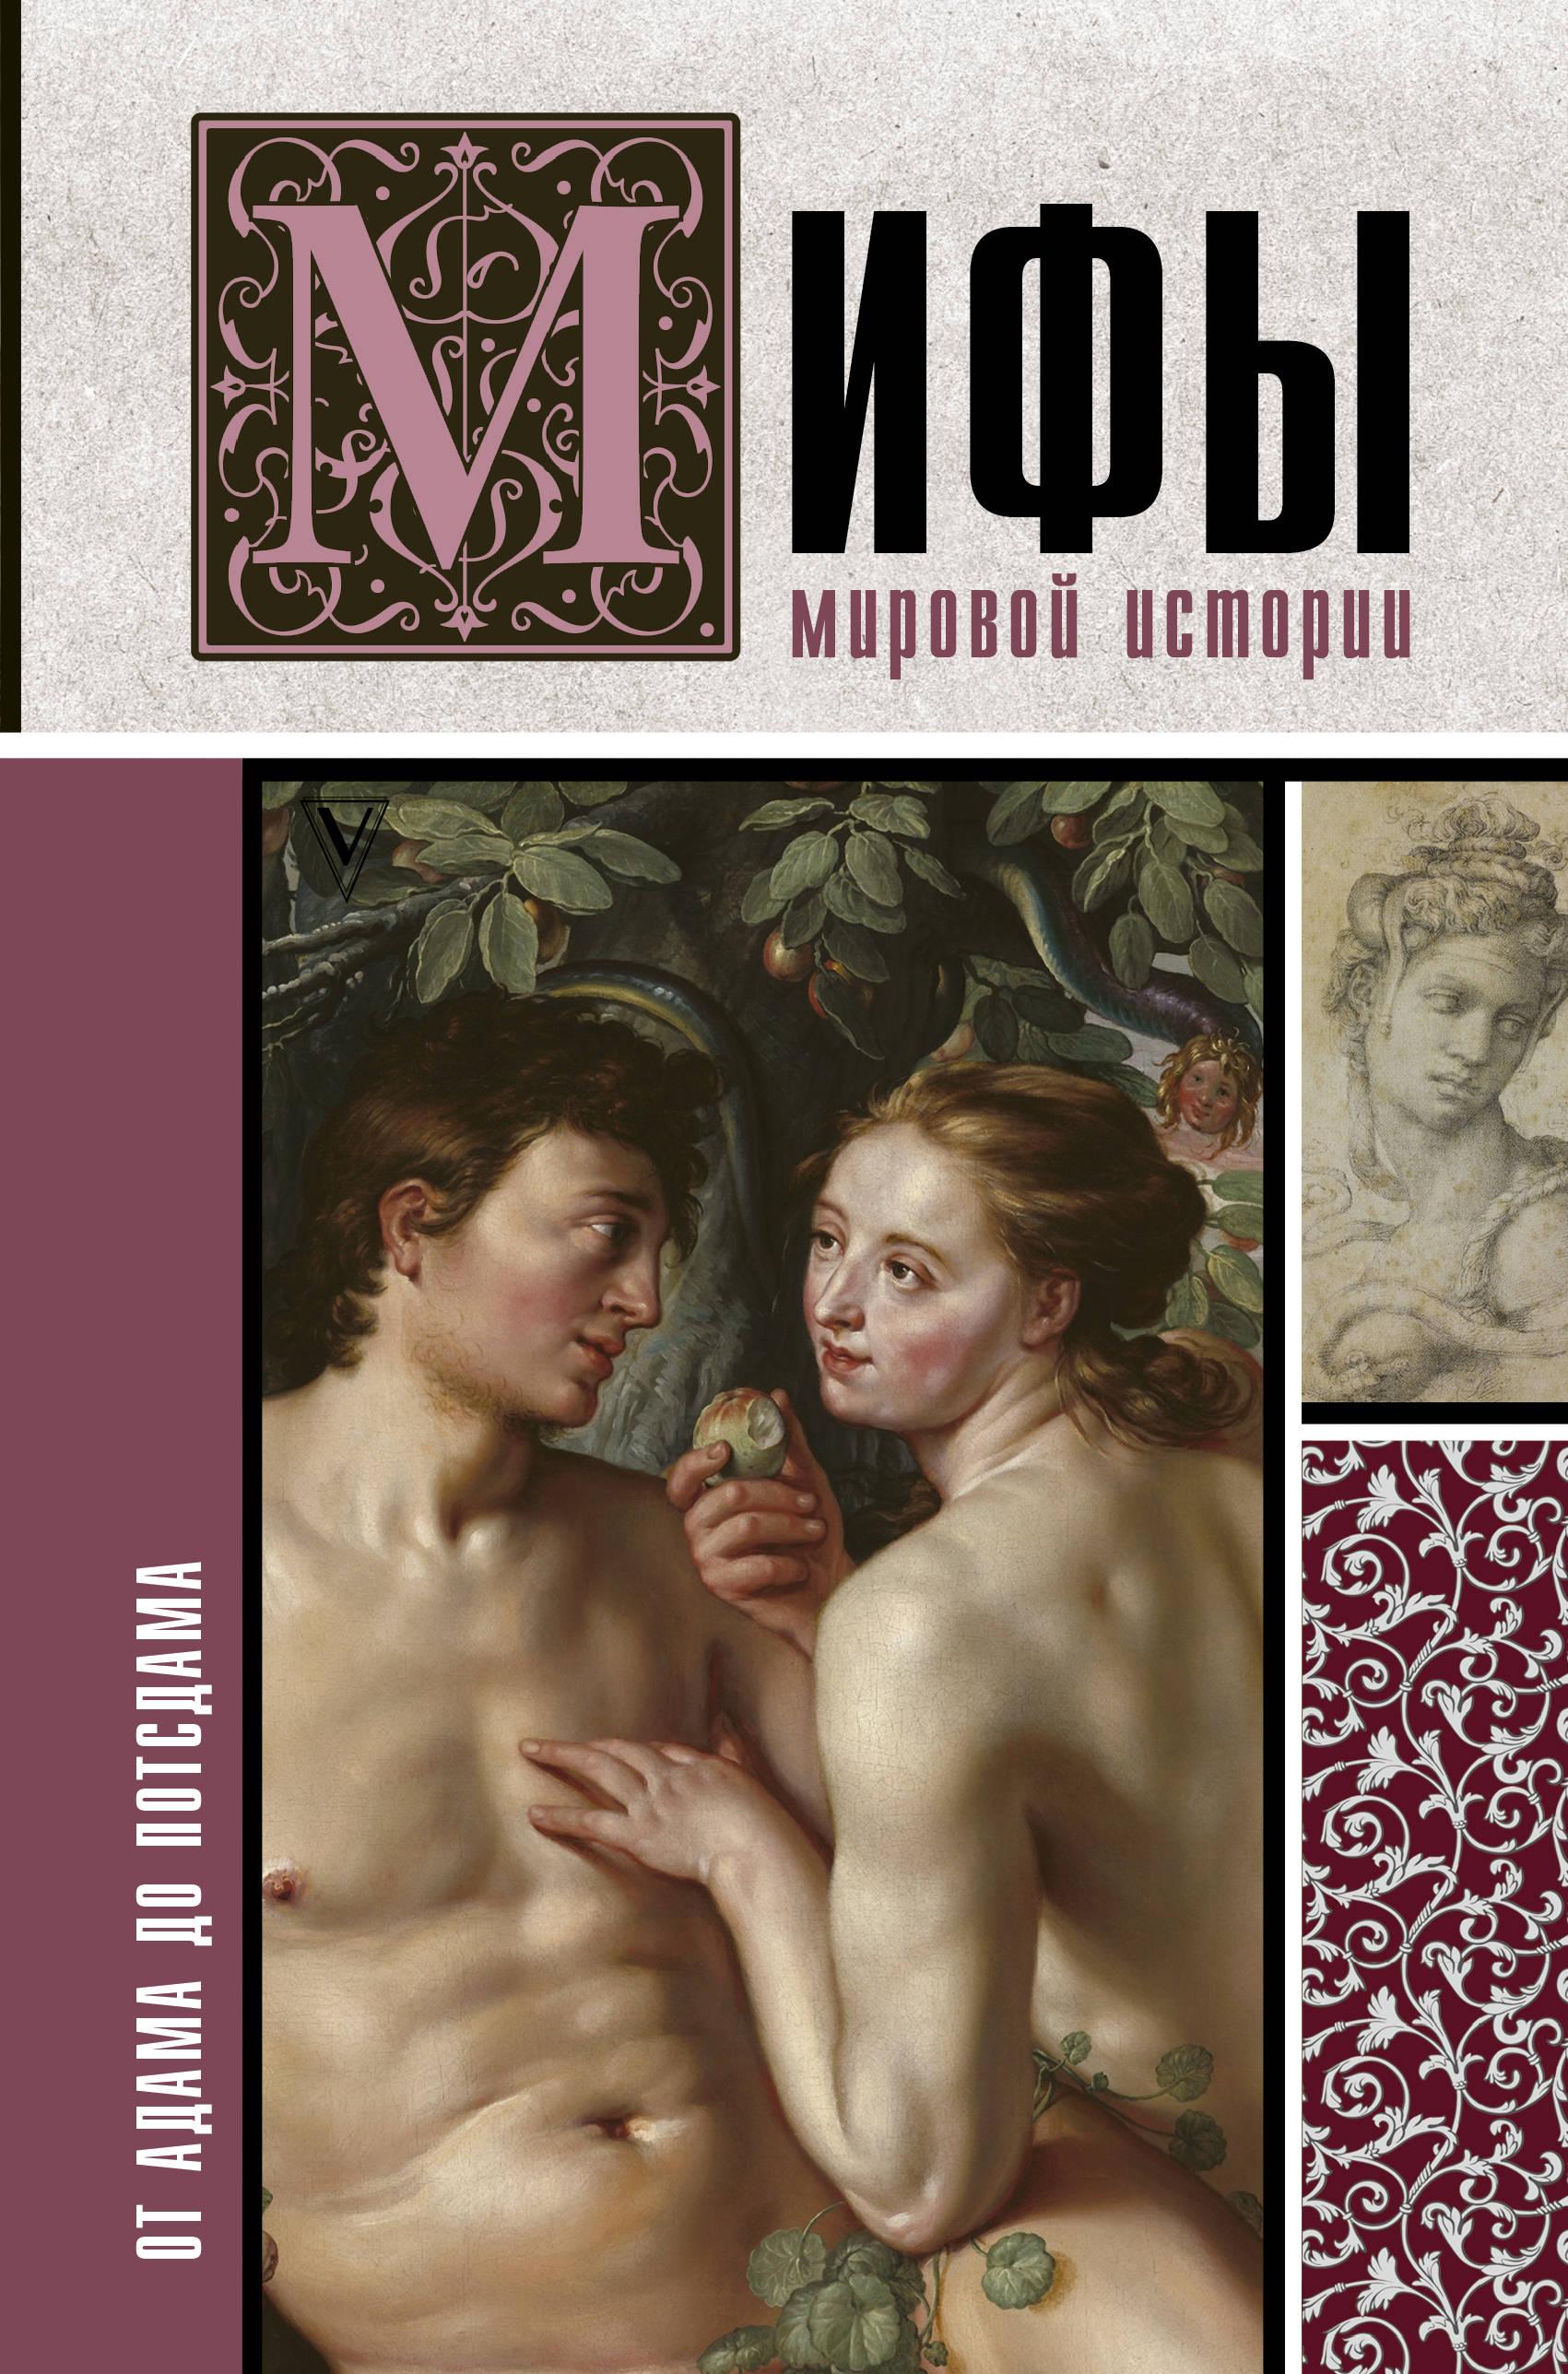 Mify mirovoj istorii: ot Adama do Potsdama